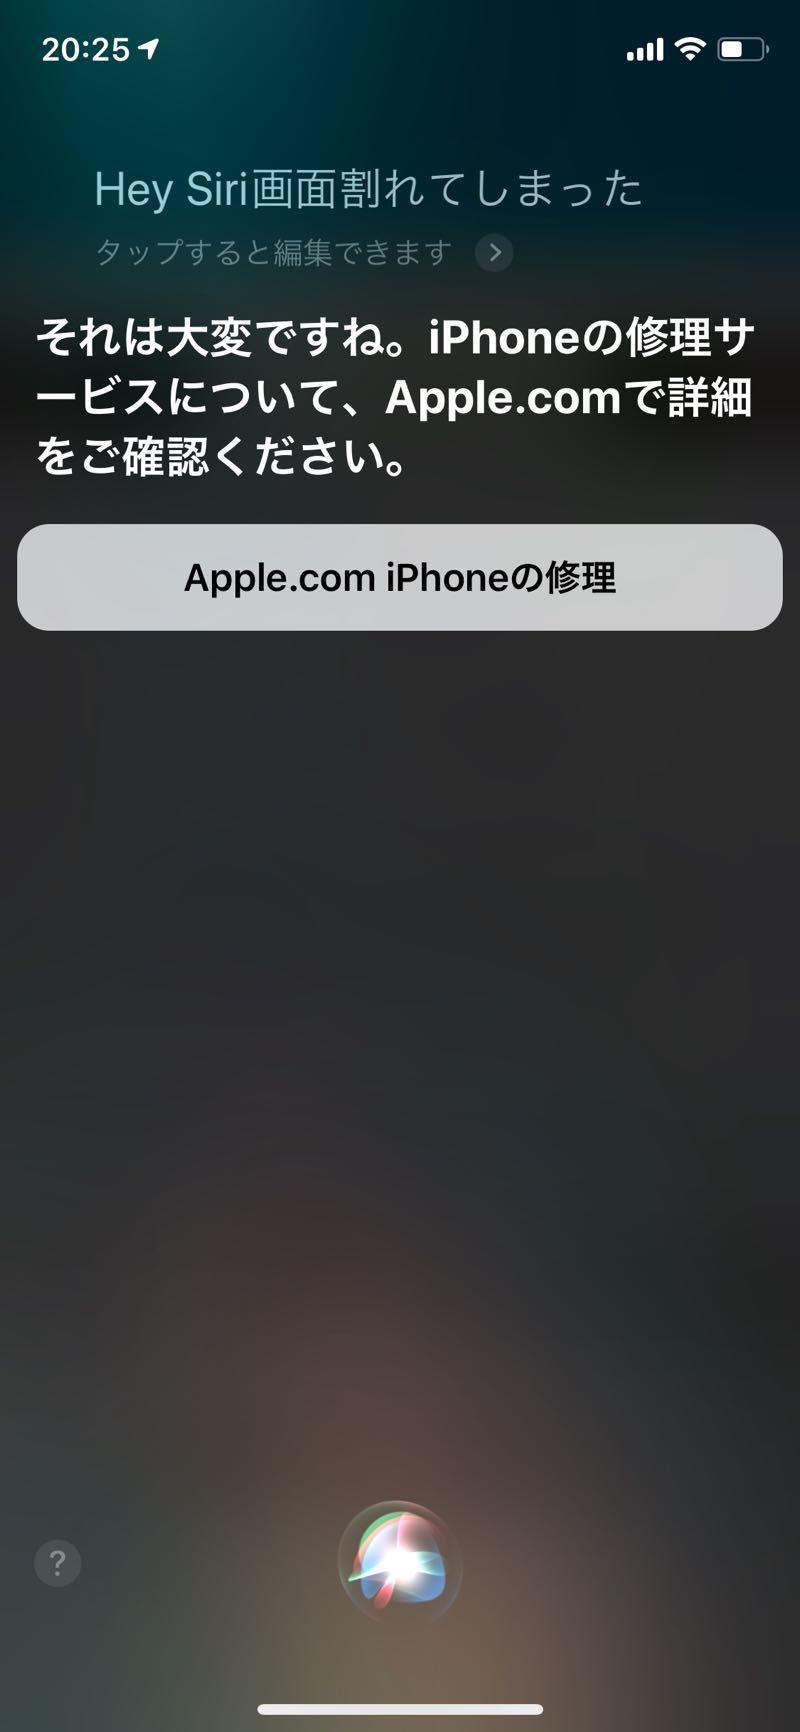 Siriに頼んでも対応教えてくれる